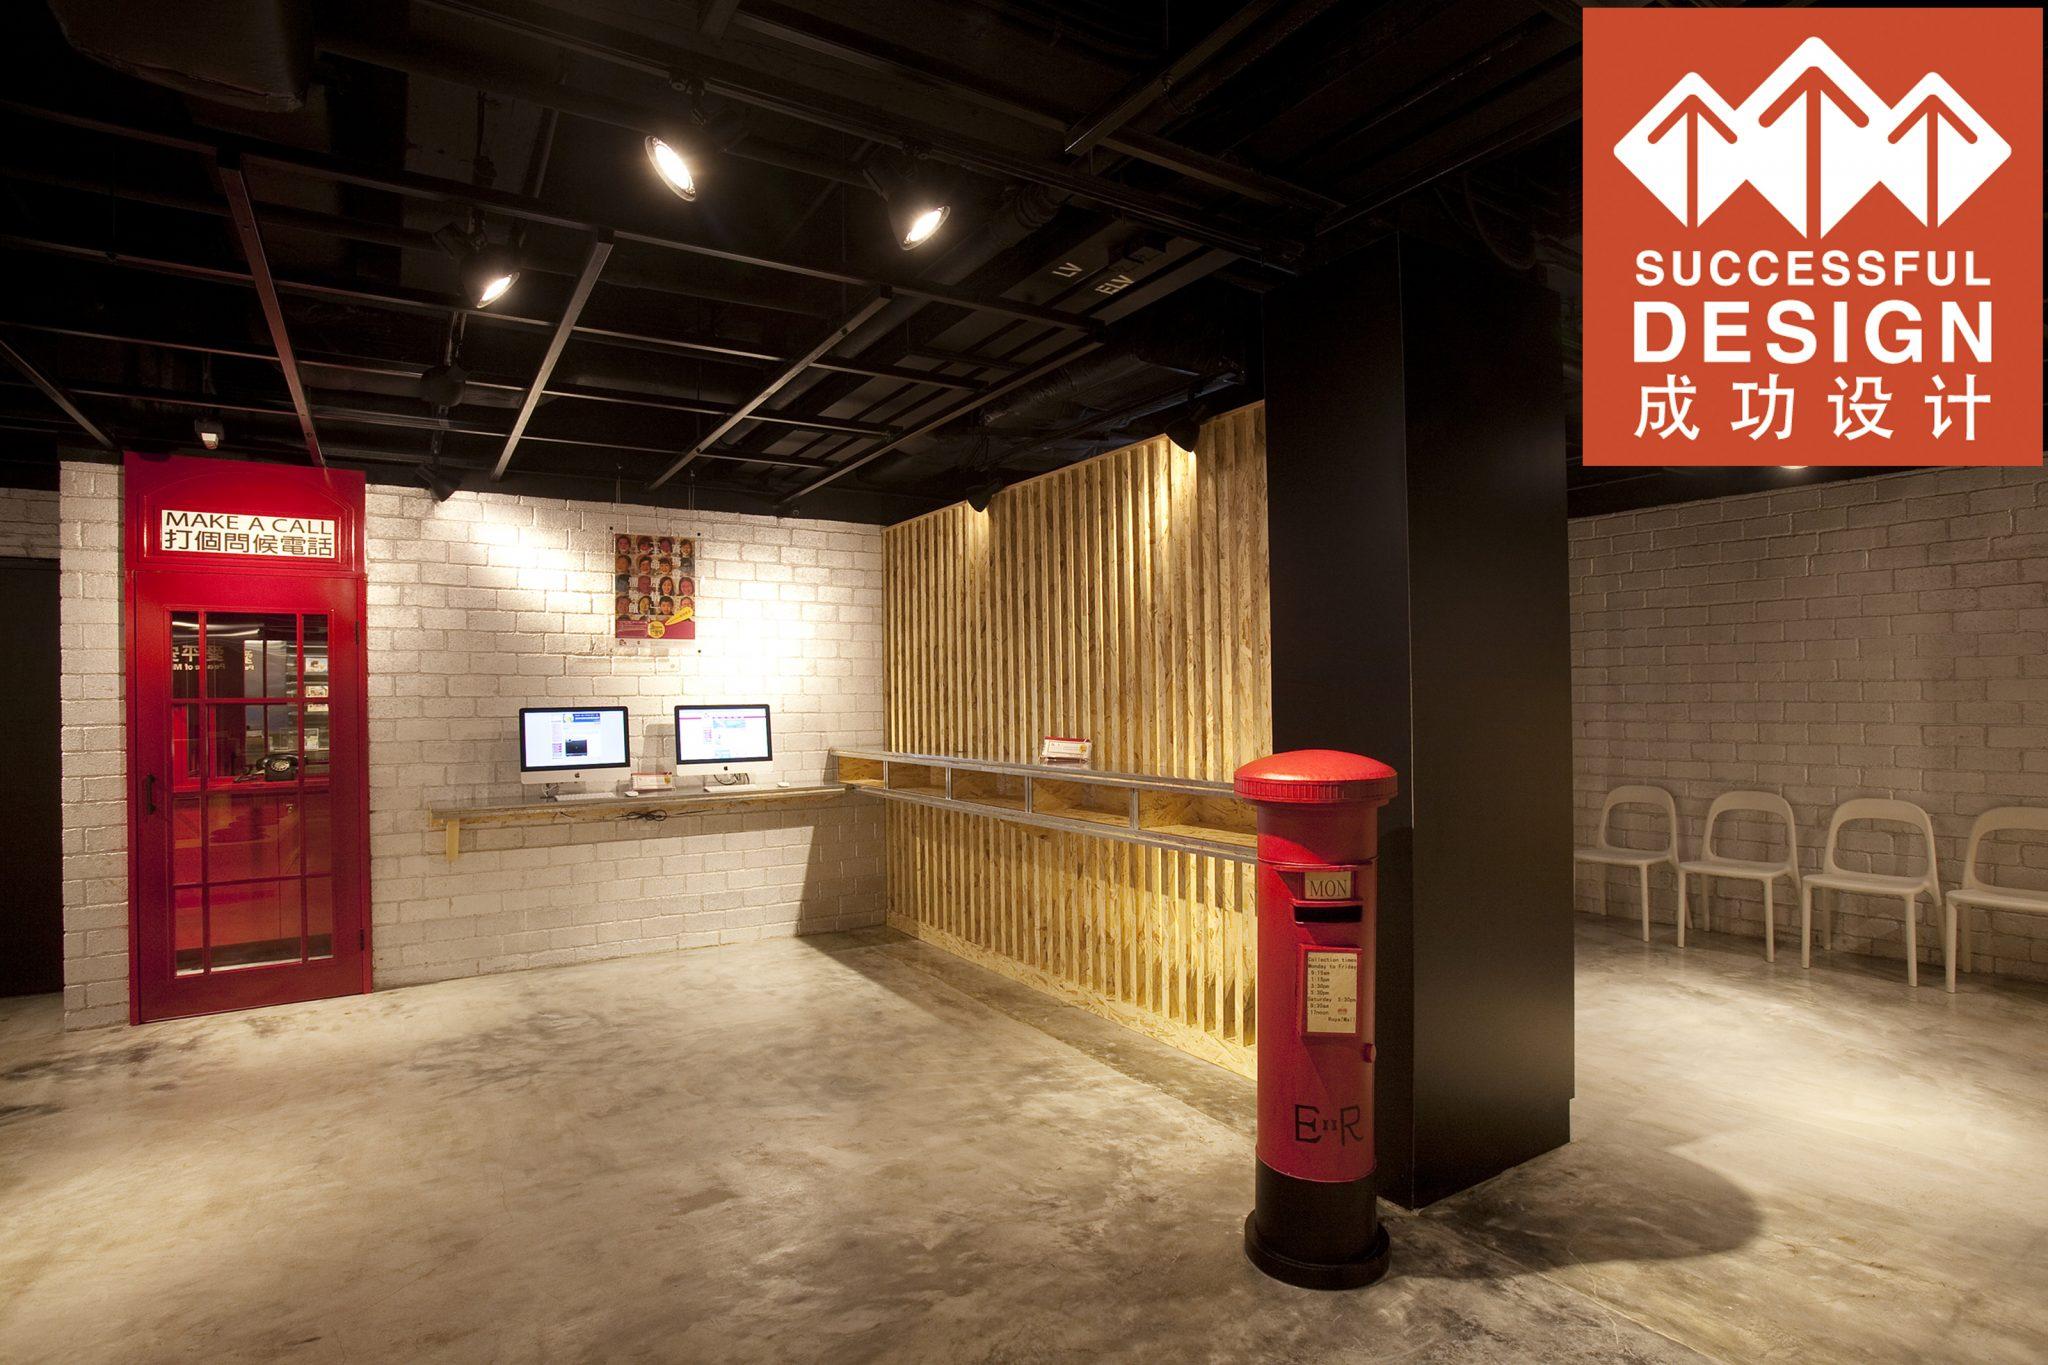 Jockey Club Life Journey Centre – Successful Design Award 2014